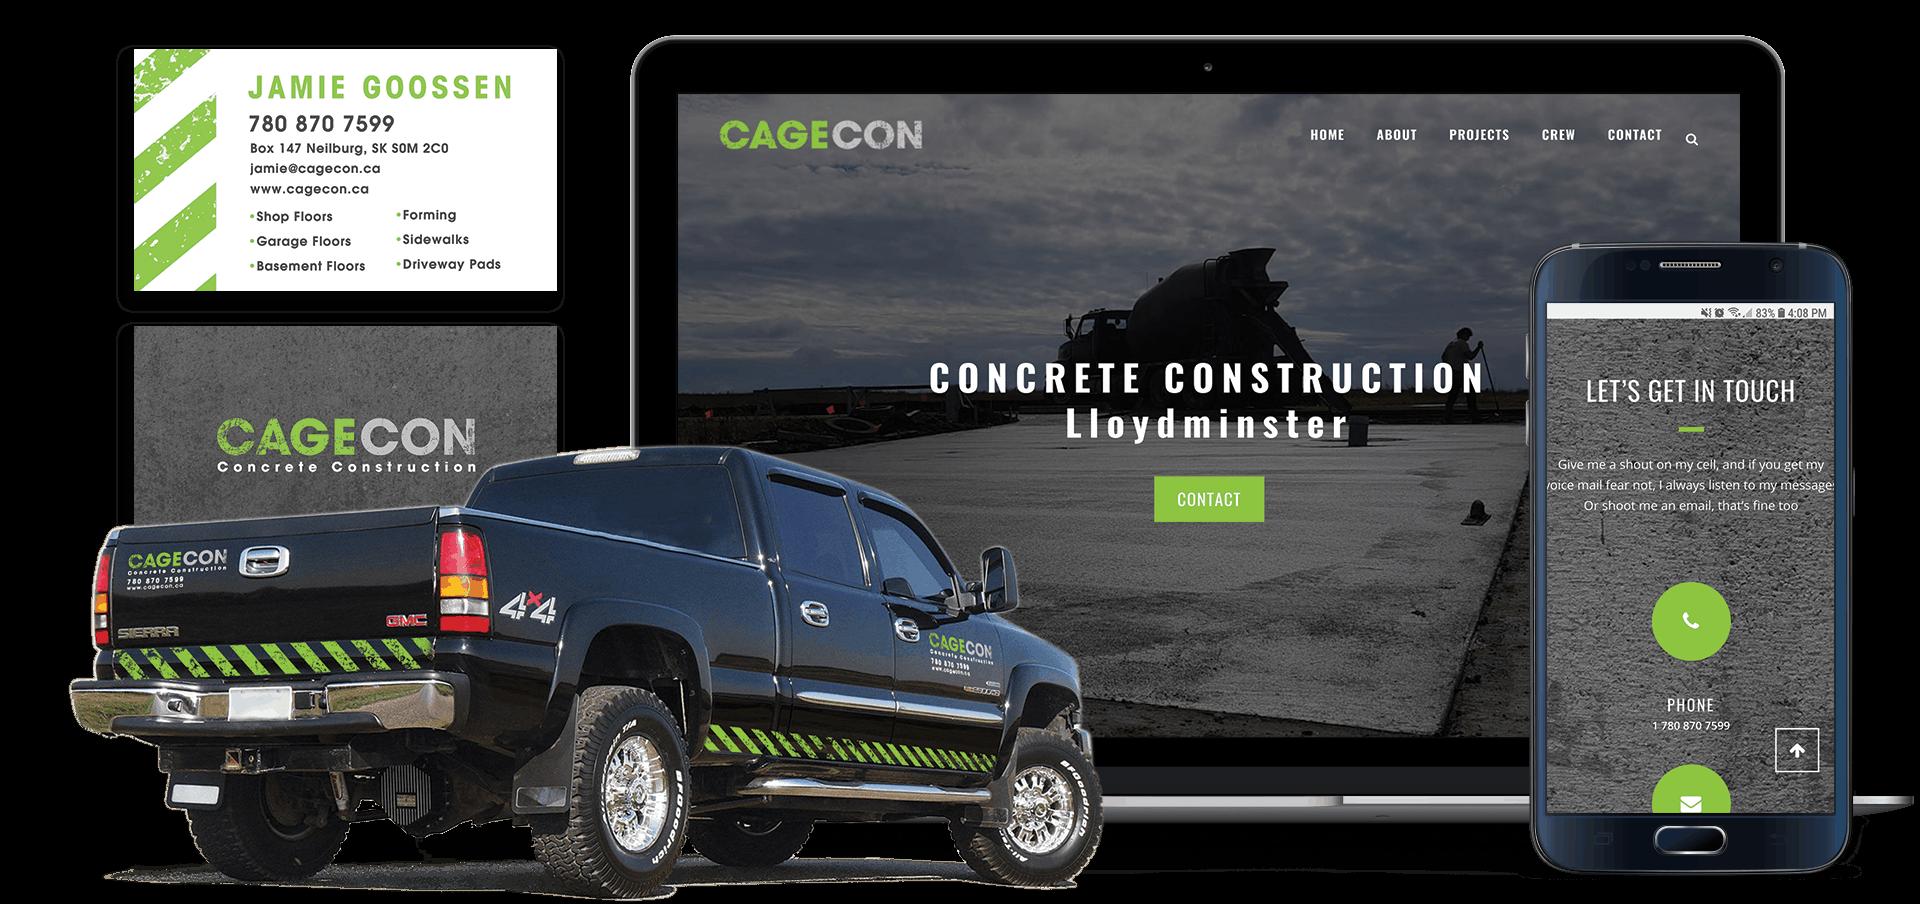 1-CageCon-Construction-Brand-Identity